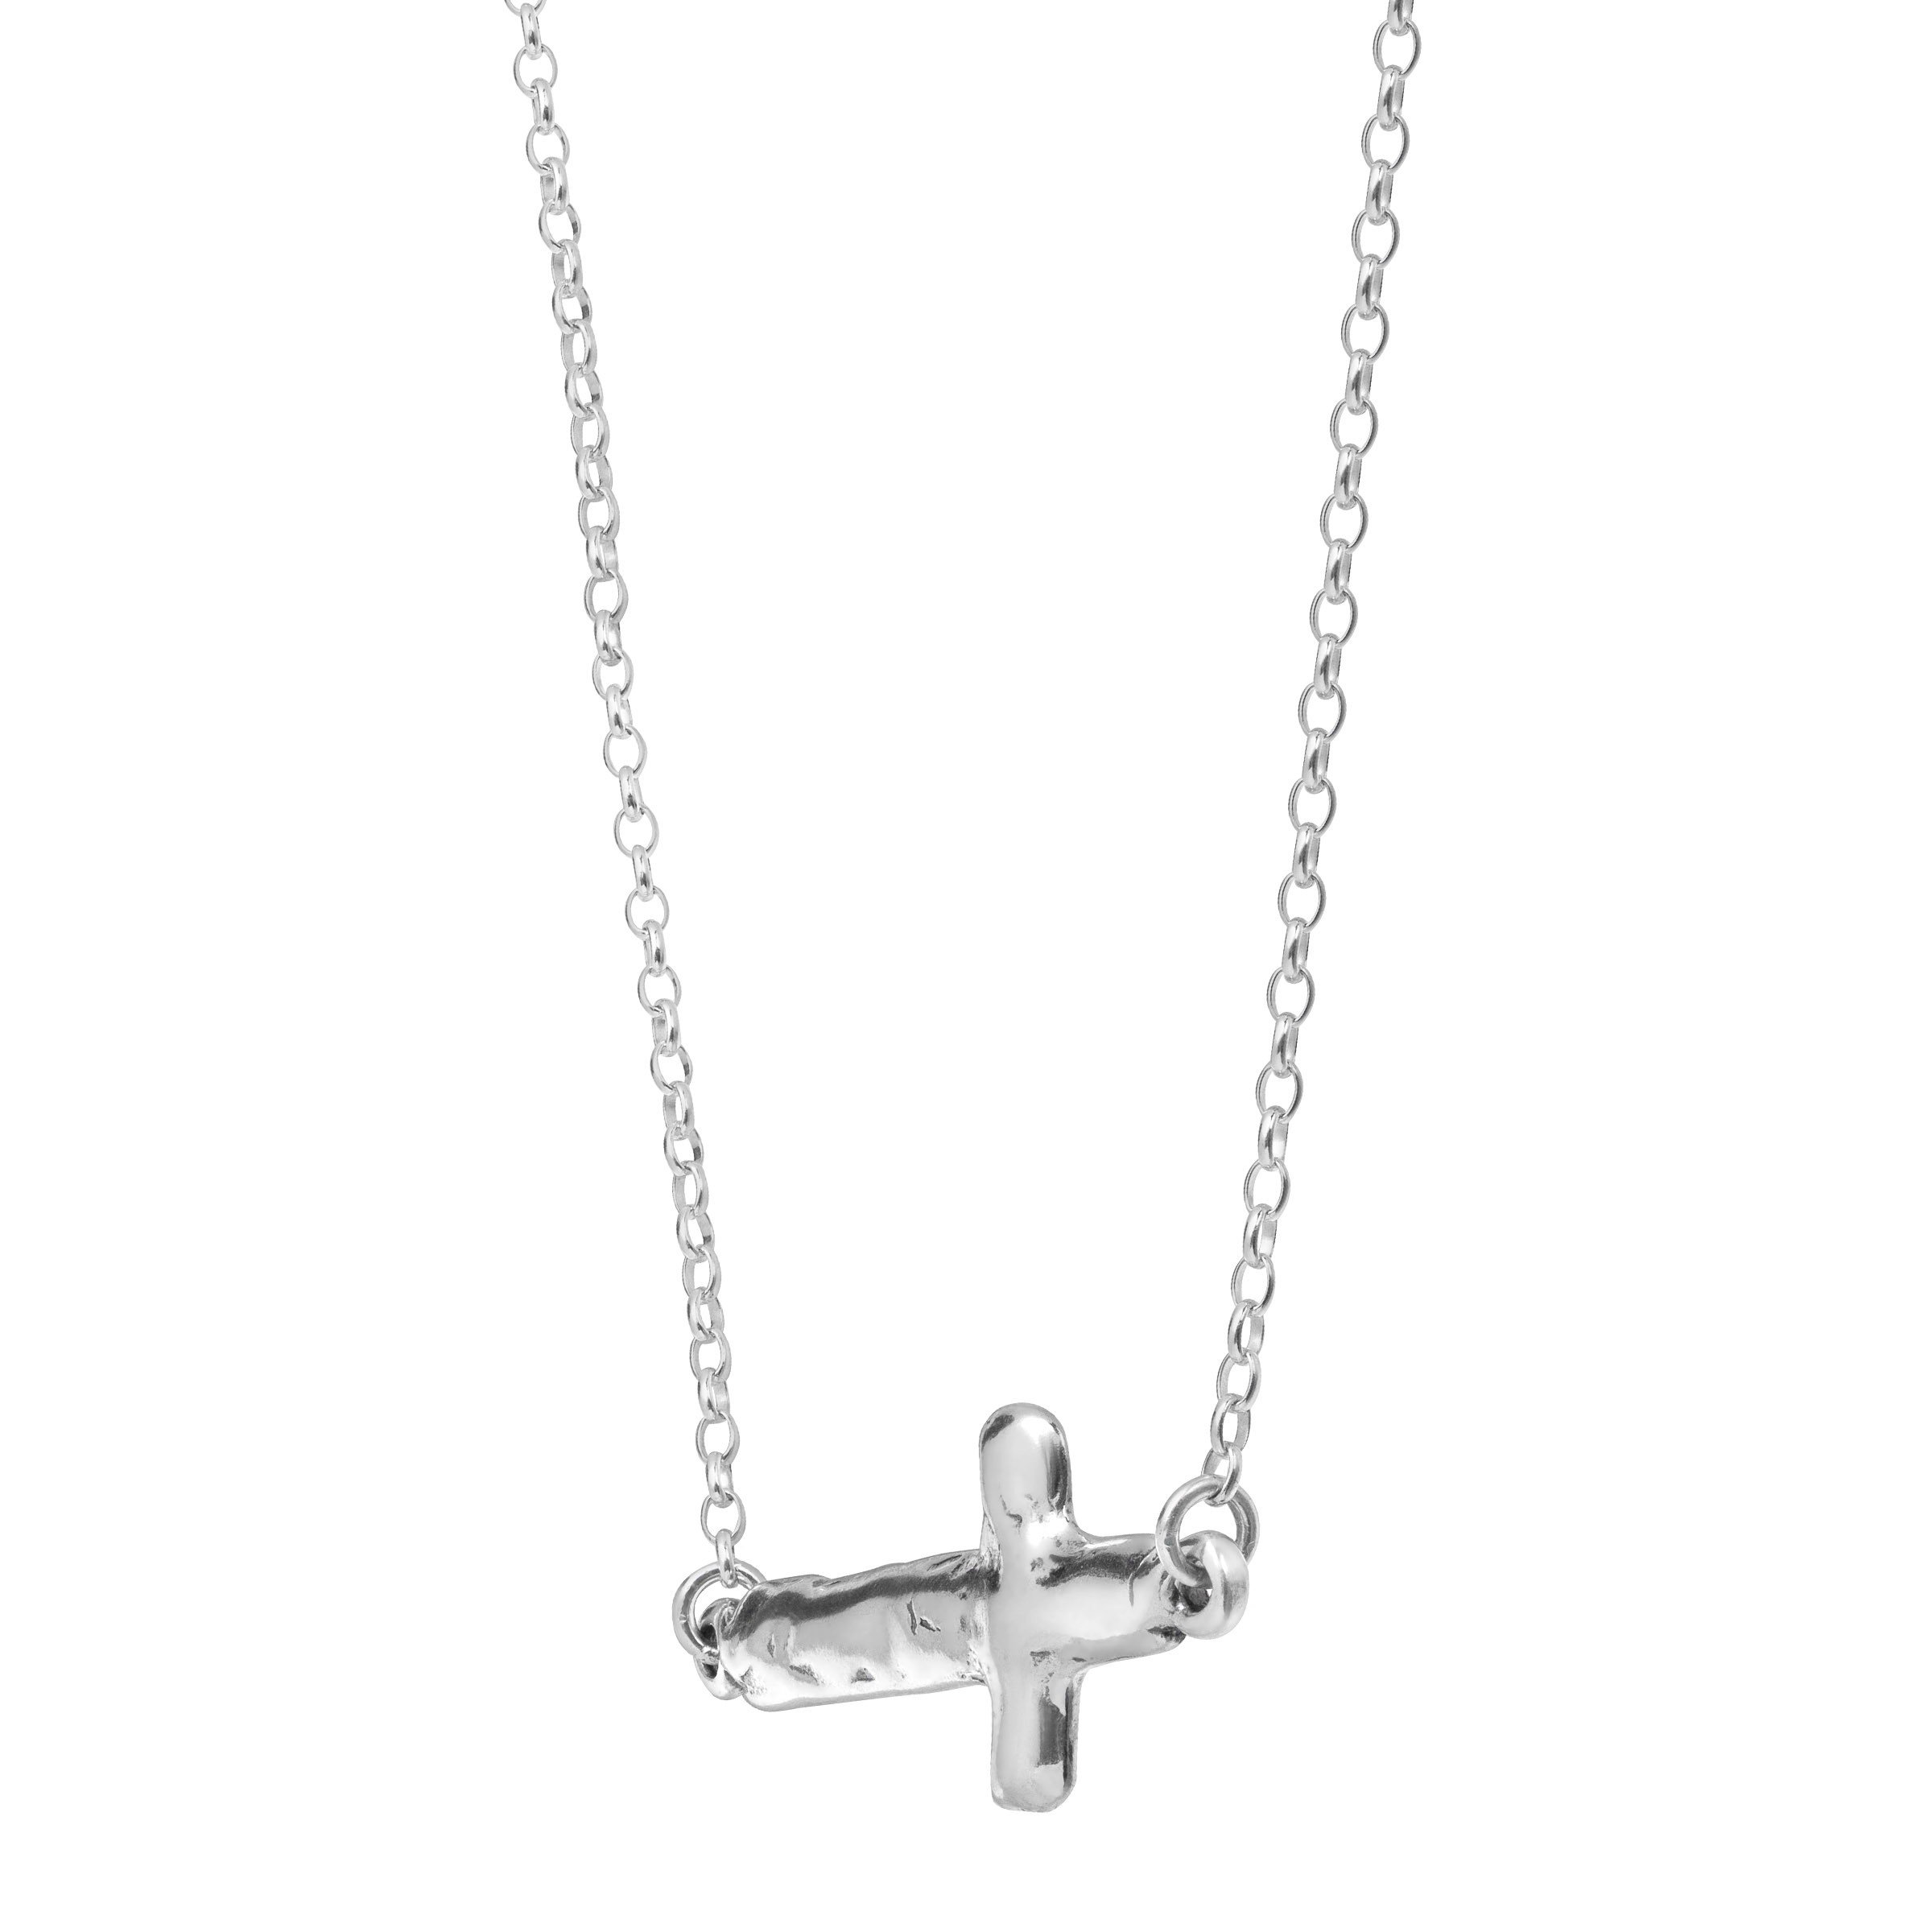 Silpada 'Cross My Art' Horizontal Cross Necklace in Sterling Silver by Silpada (Image #2)